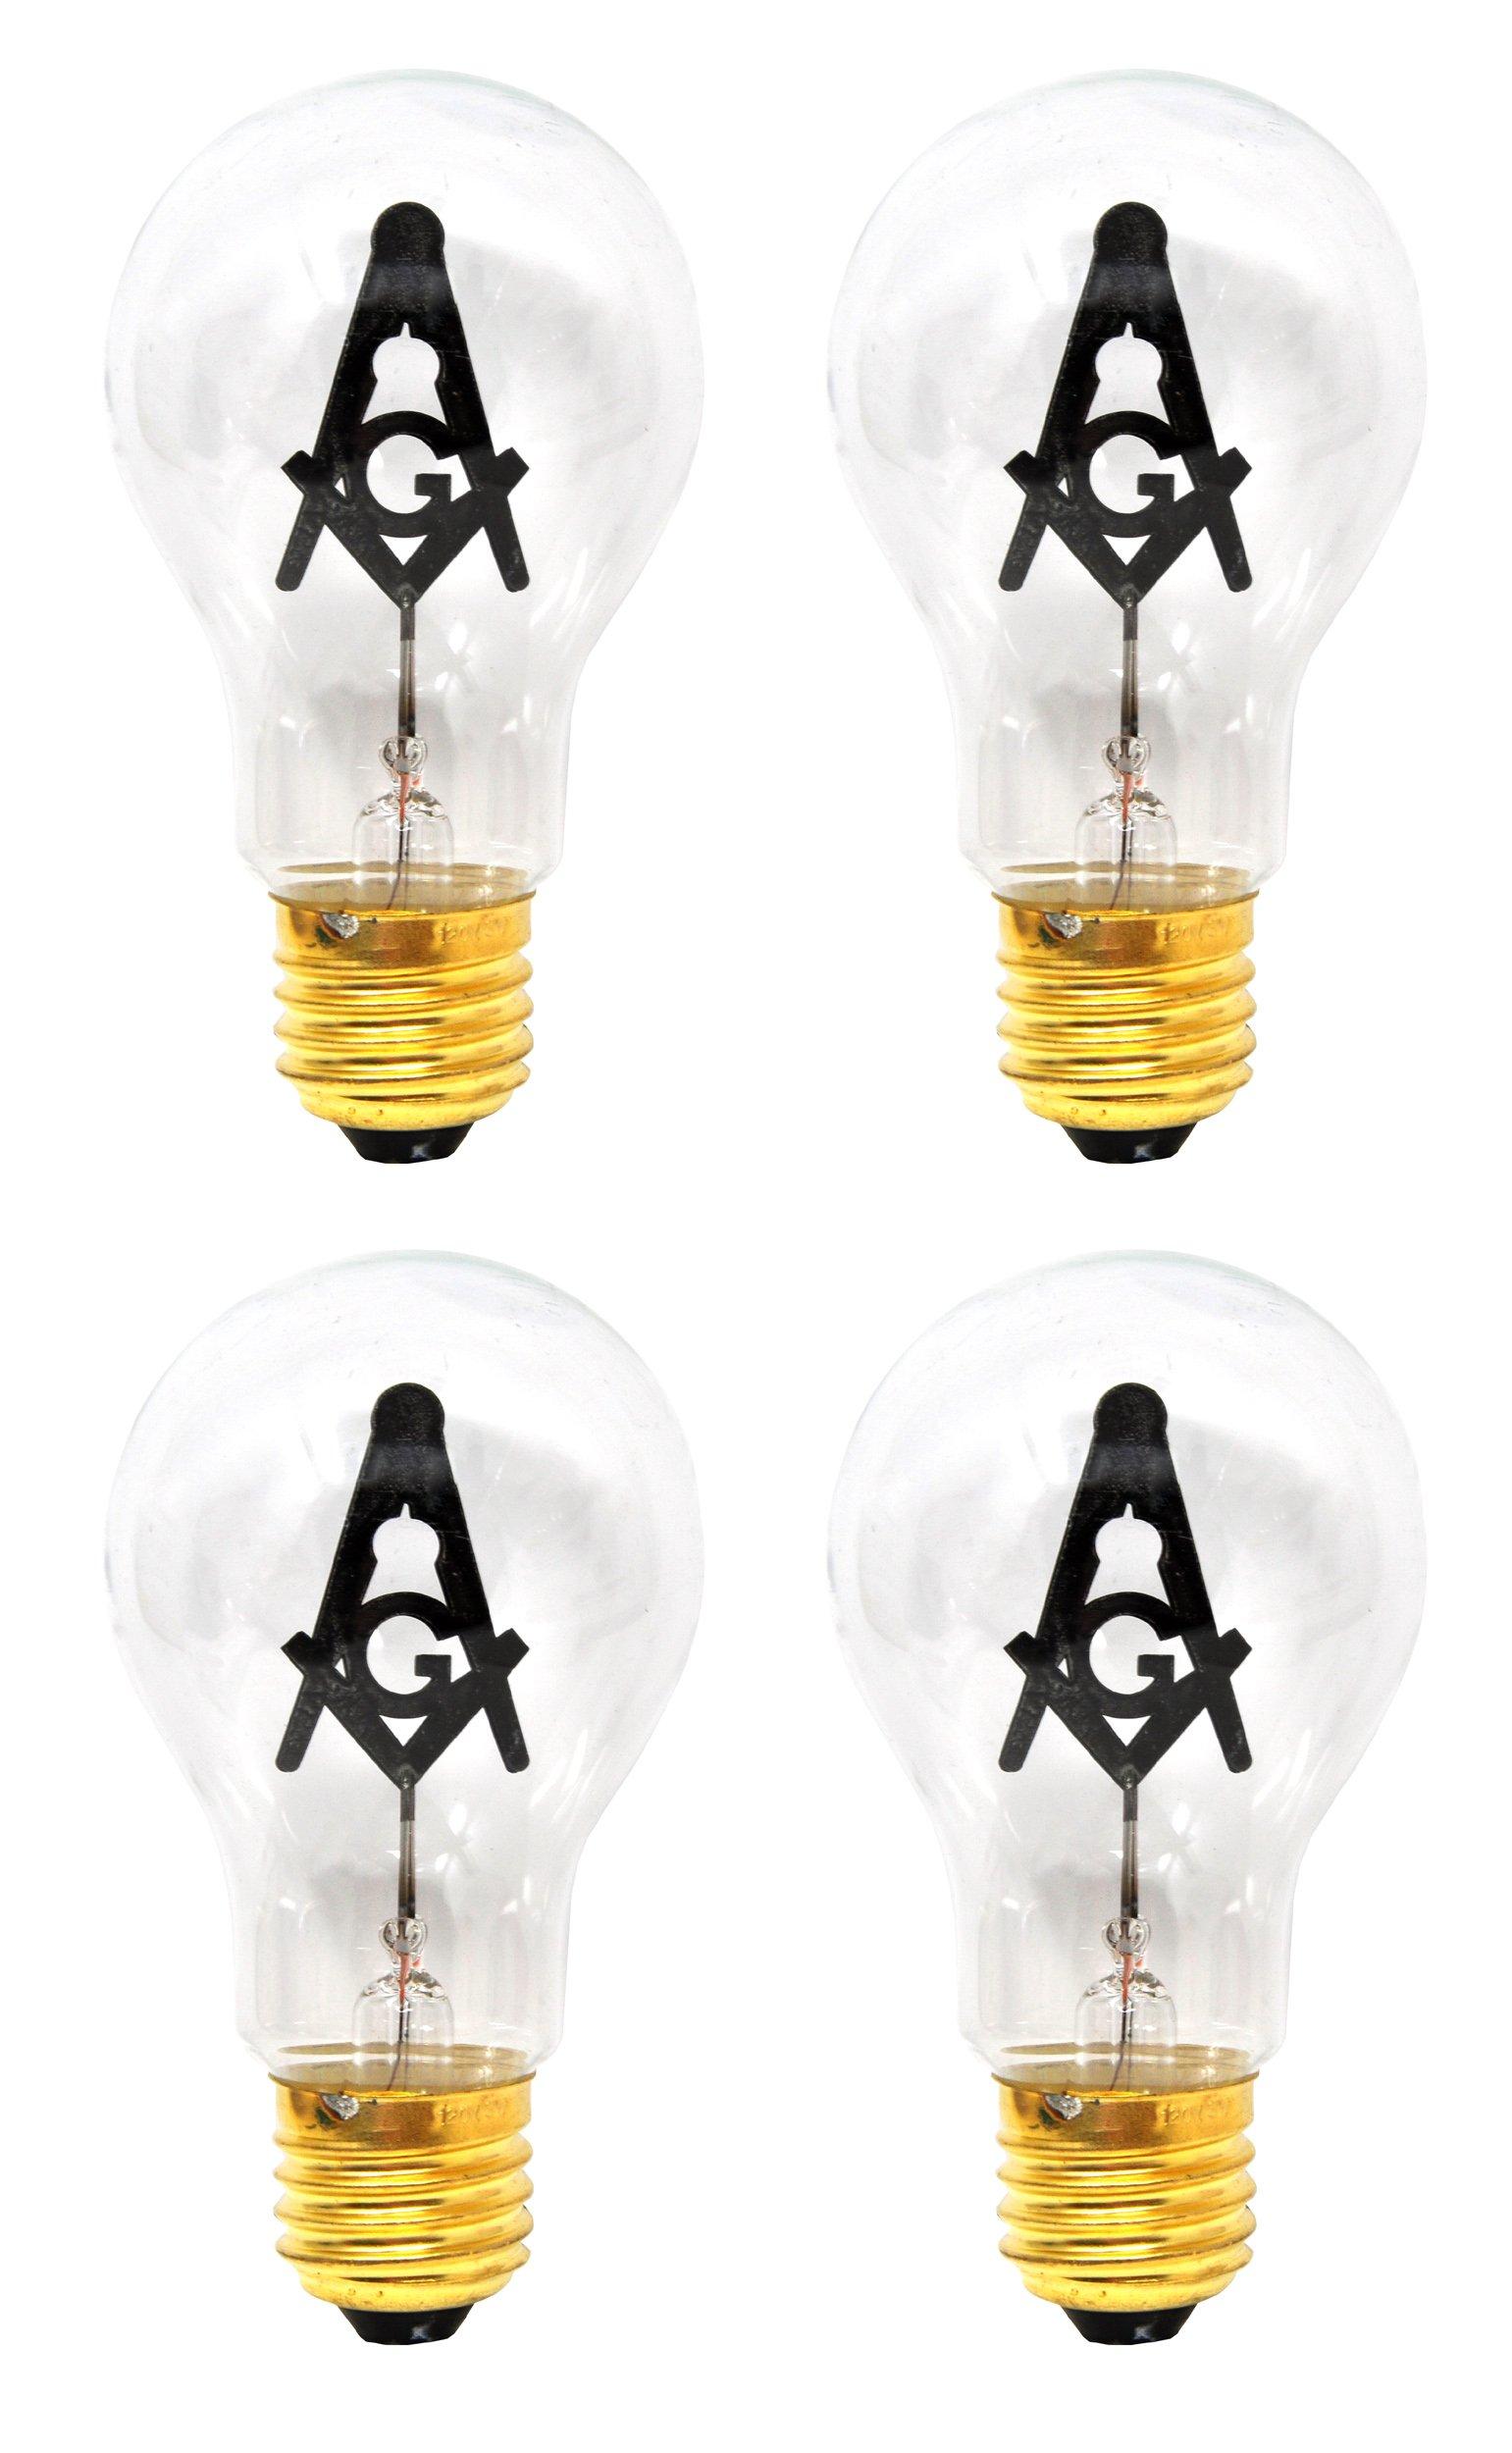 Mandala Crafts E27 3W Freemason Masonic Square and Compasses Emblem Symbol Altar Decor Lodge Light Bulb (Standard Base, 4 Bulbs)